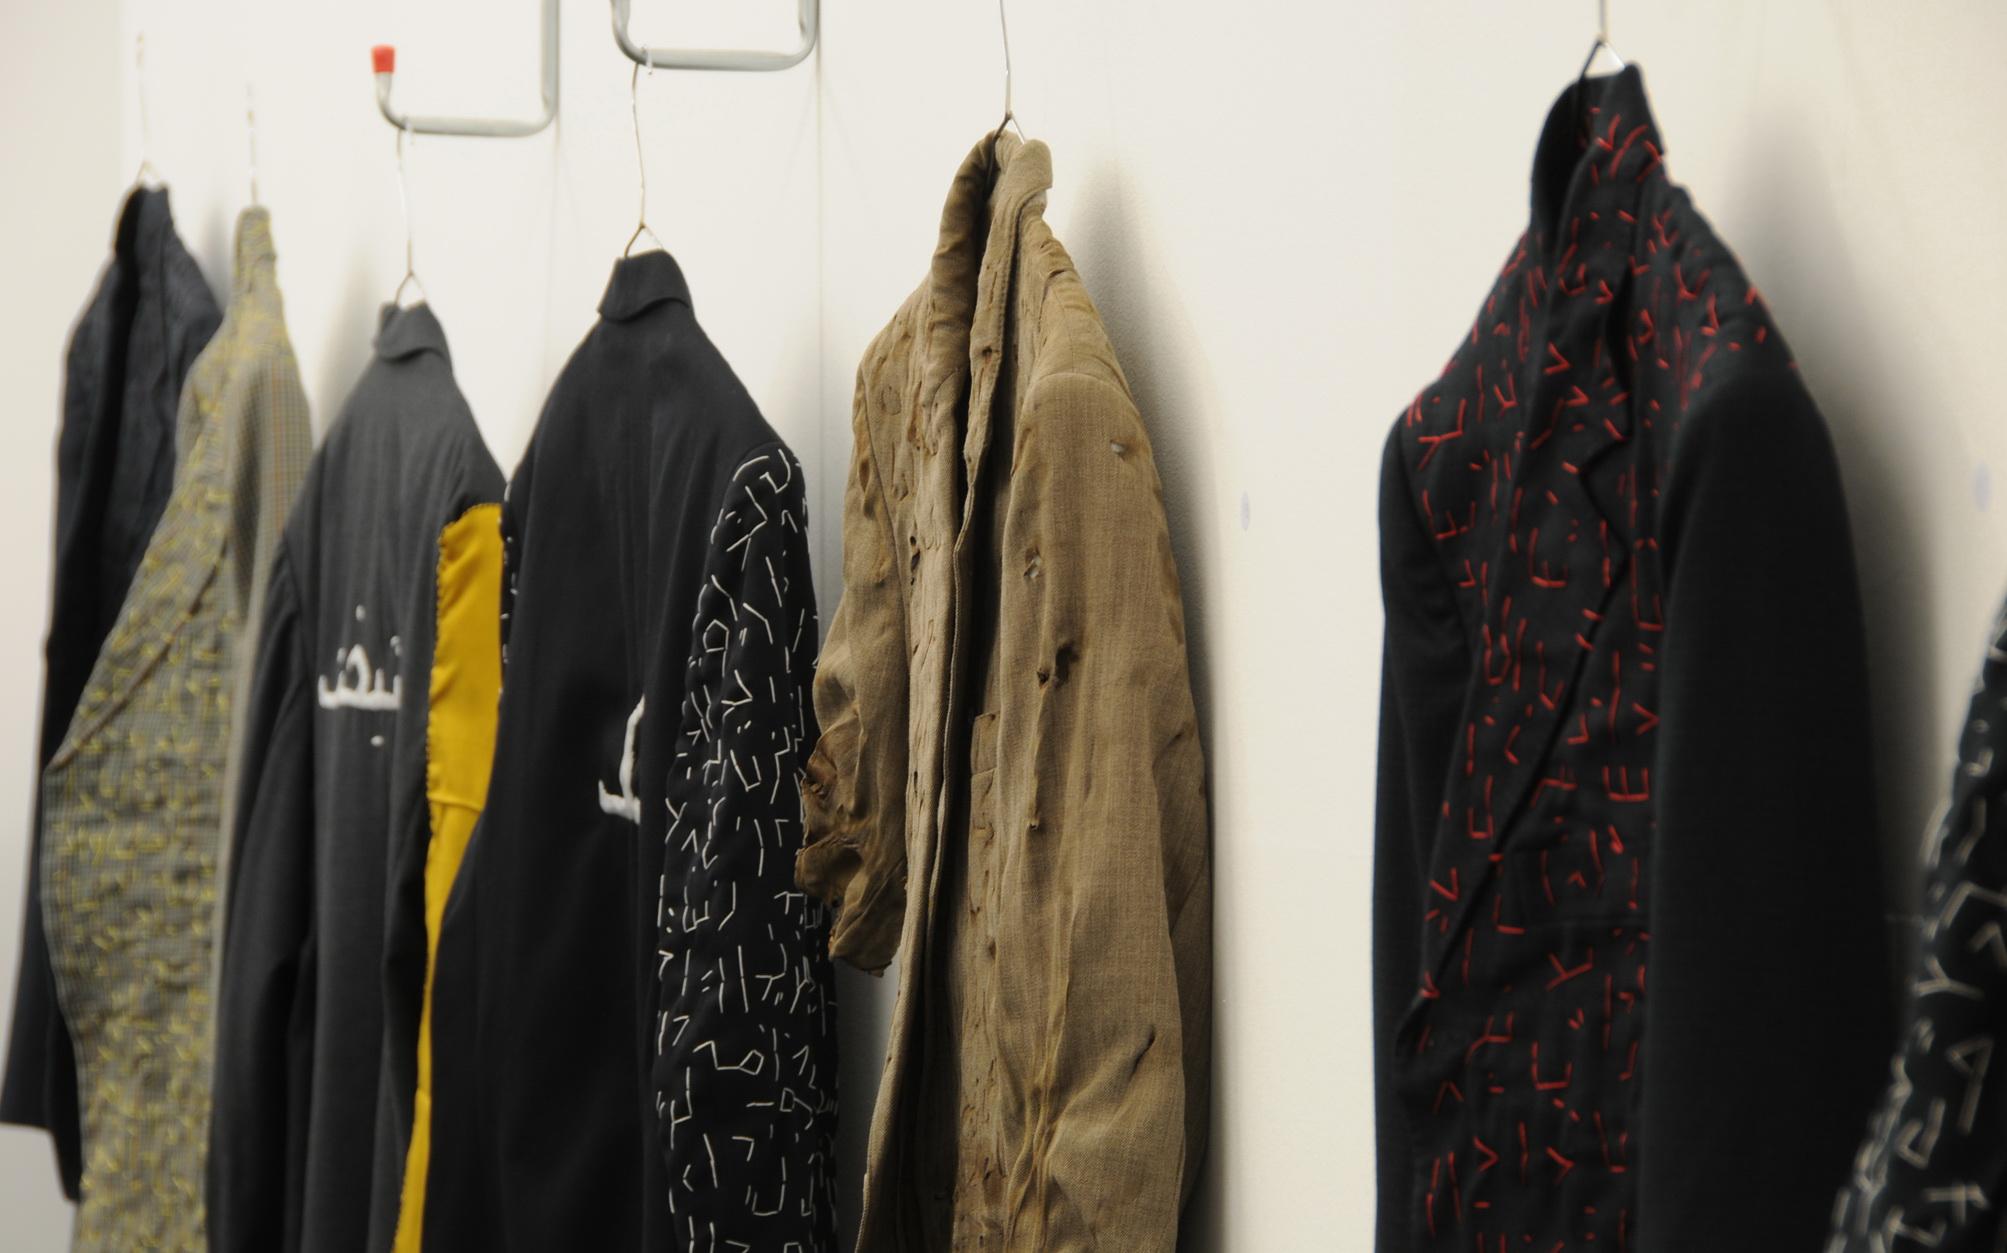 Fate+Instalition.Swing+&+Mixed+media+on+Coat.2011+(3).jpg